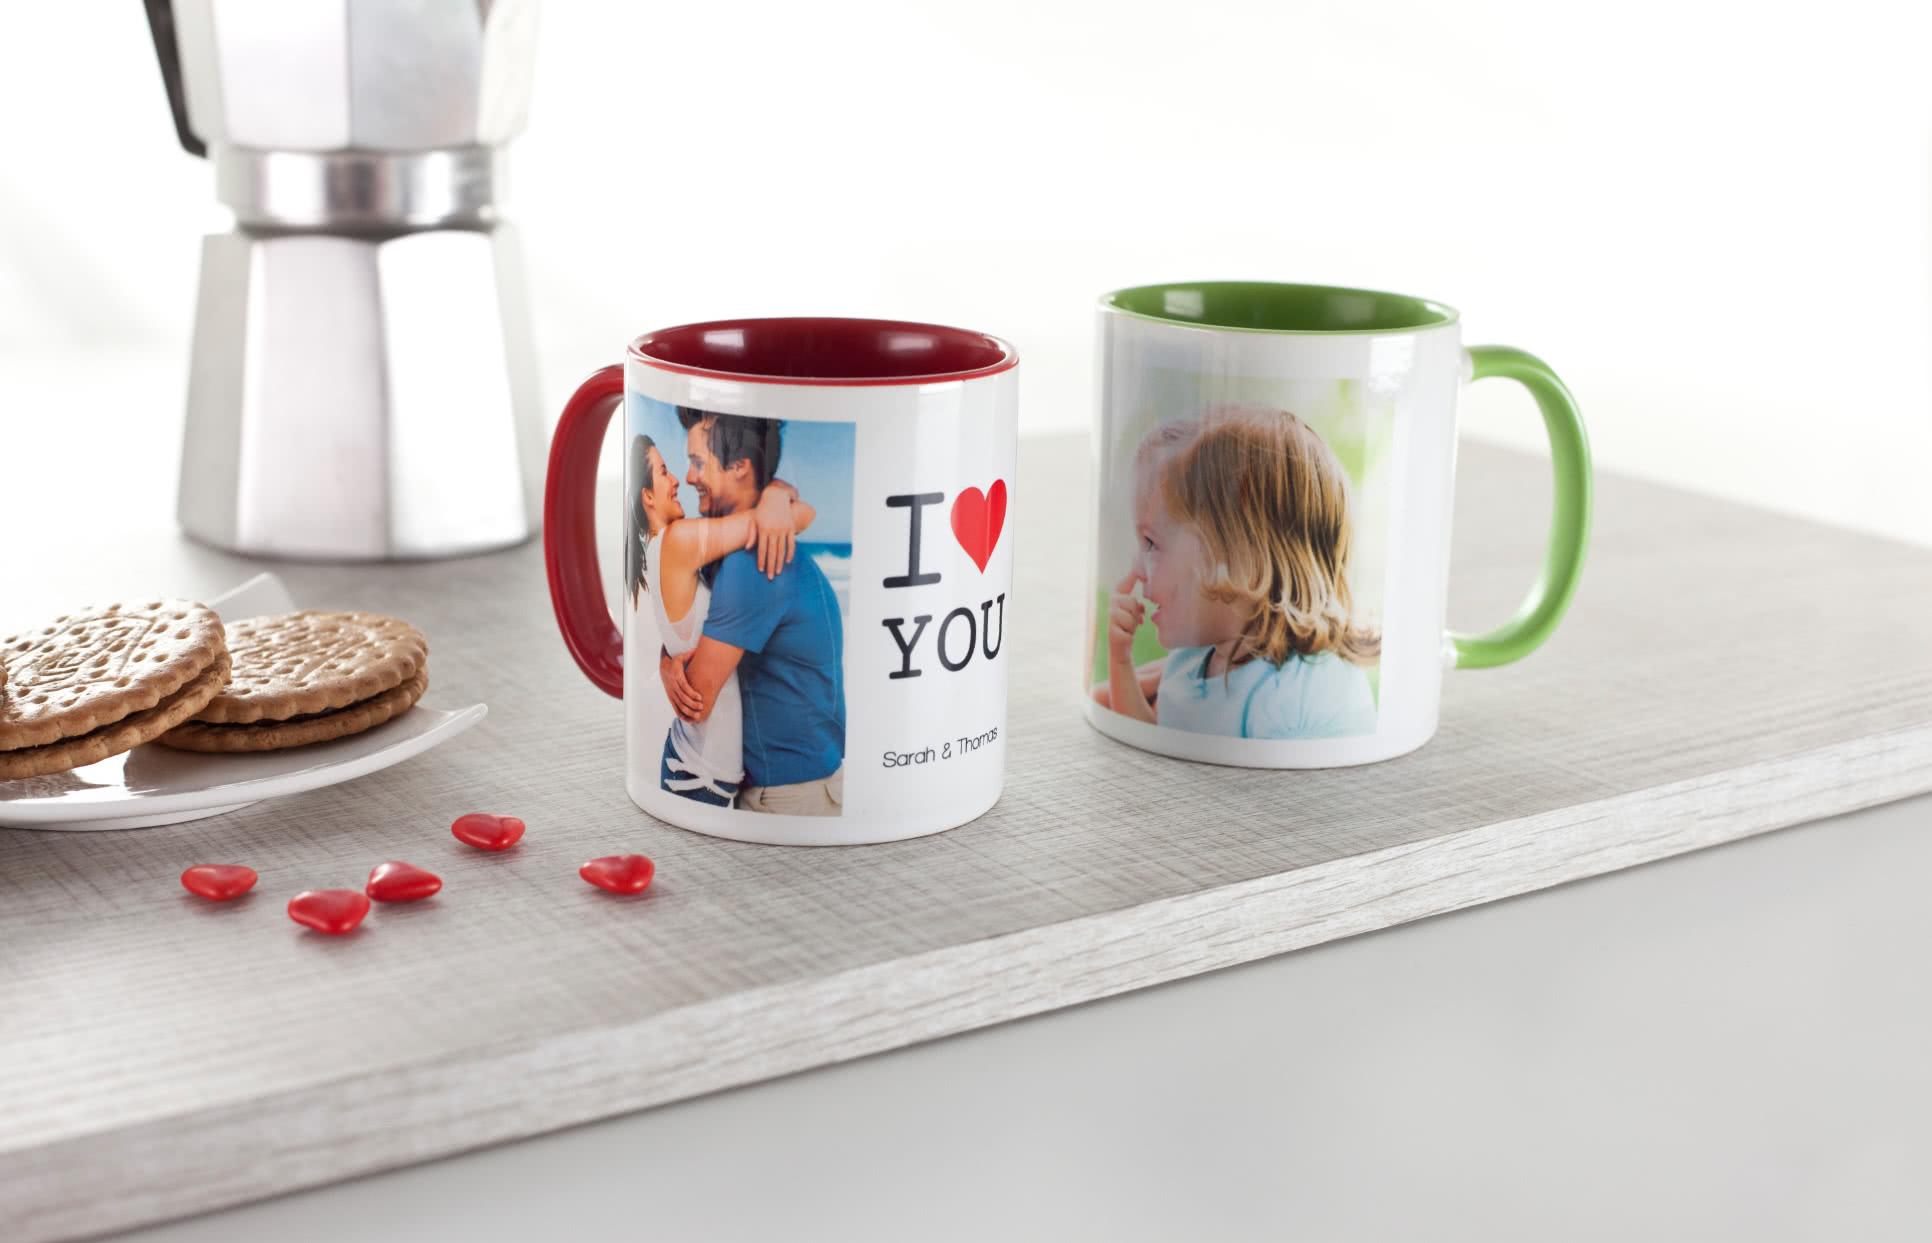 id e cadeau mug couleur personnalis avec photos. Black Bedroom Furniture Sets. Home Design Ideas